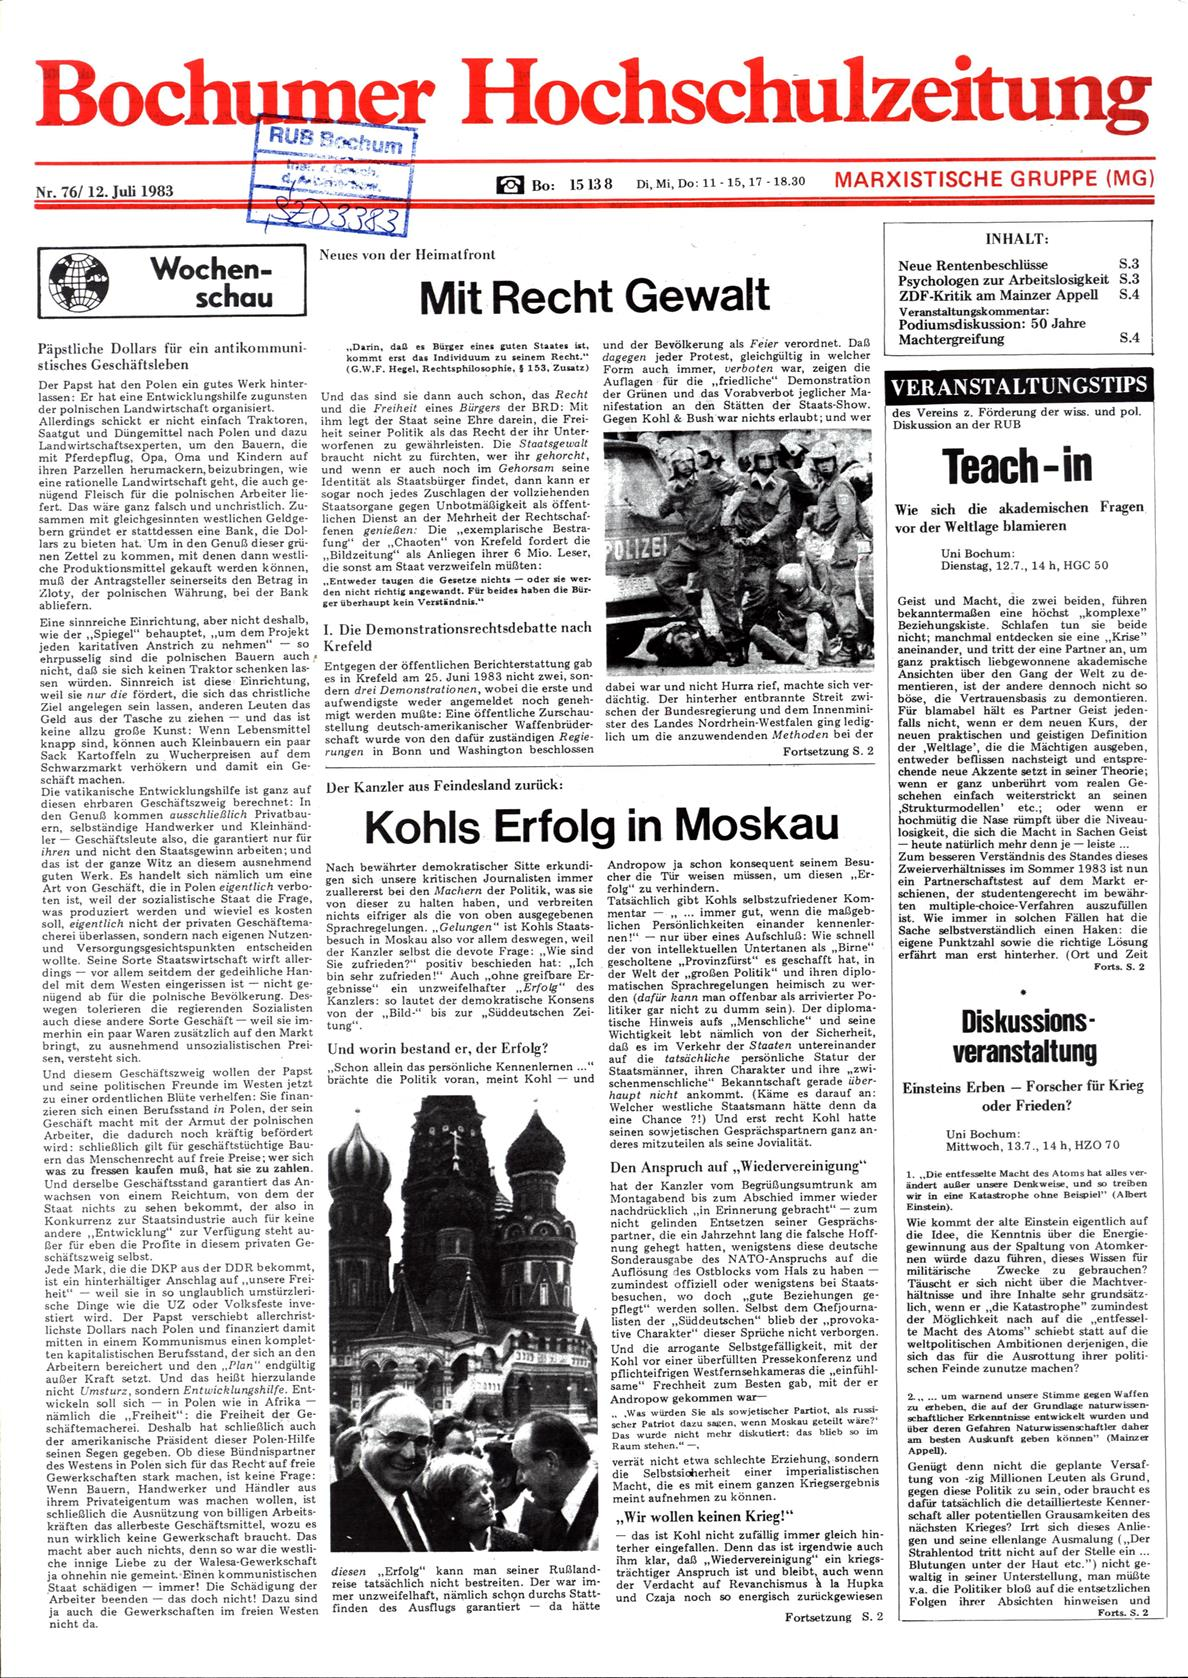 Bochum_BHZ_19830712_076_001